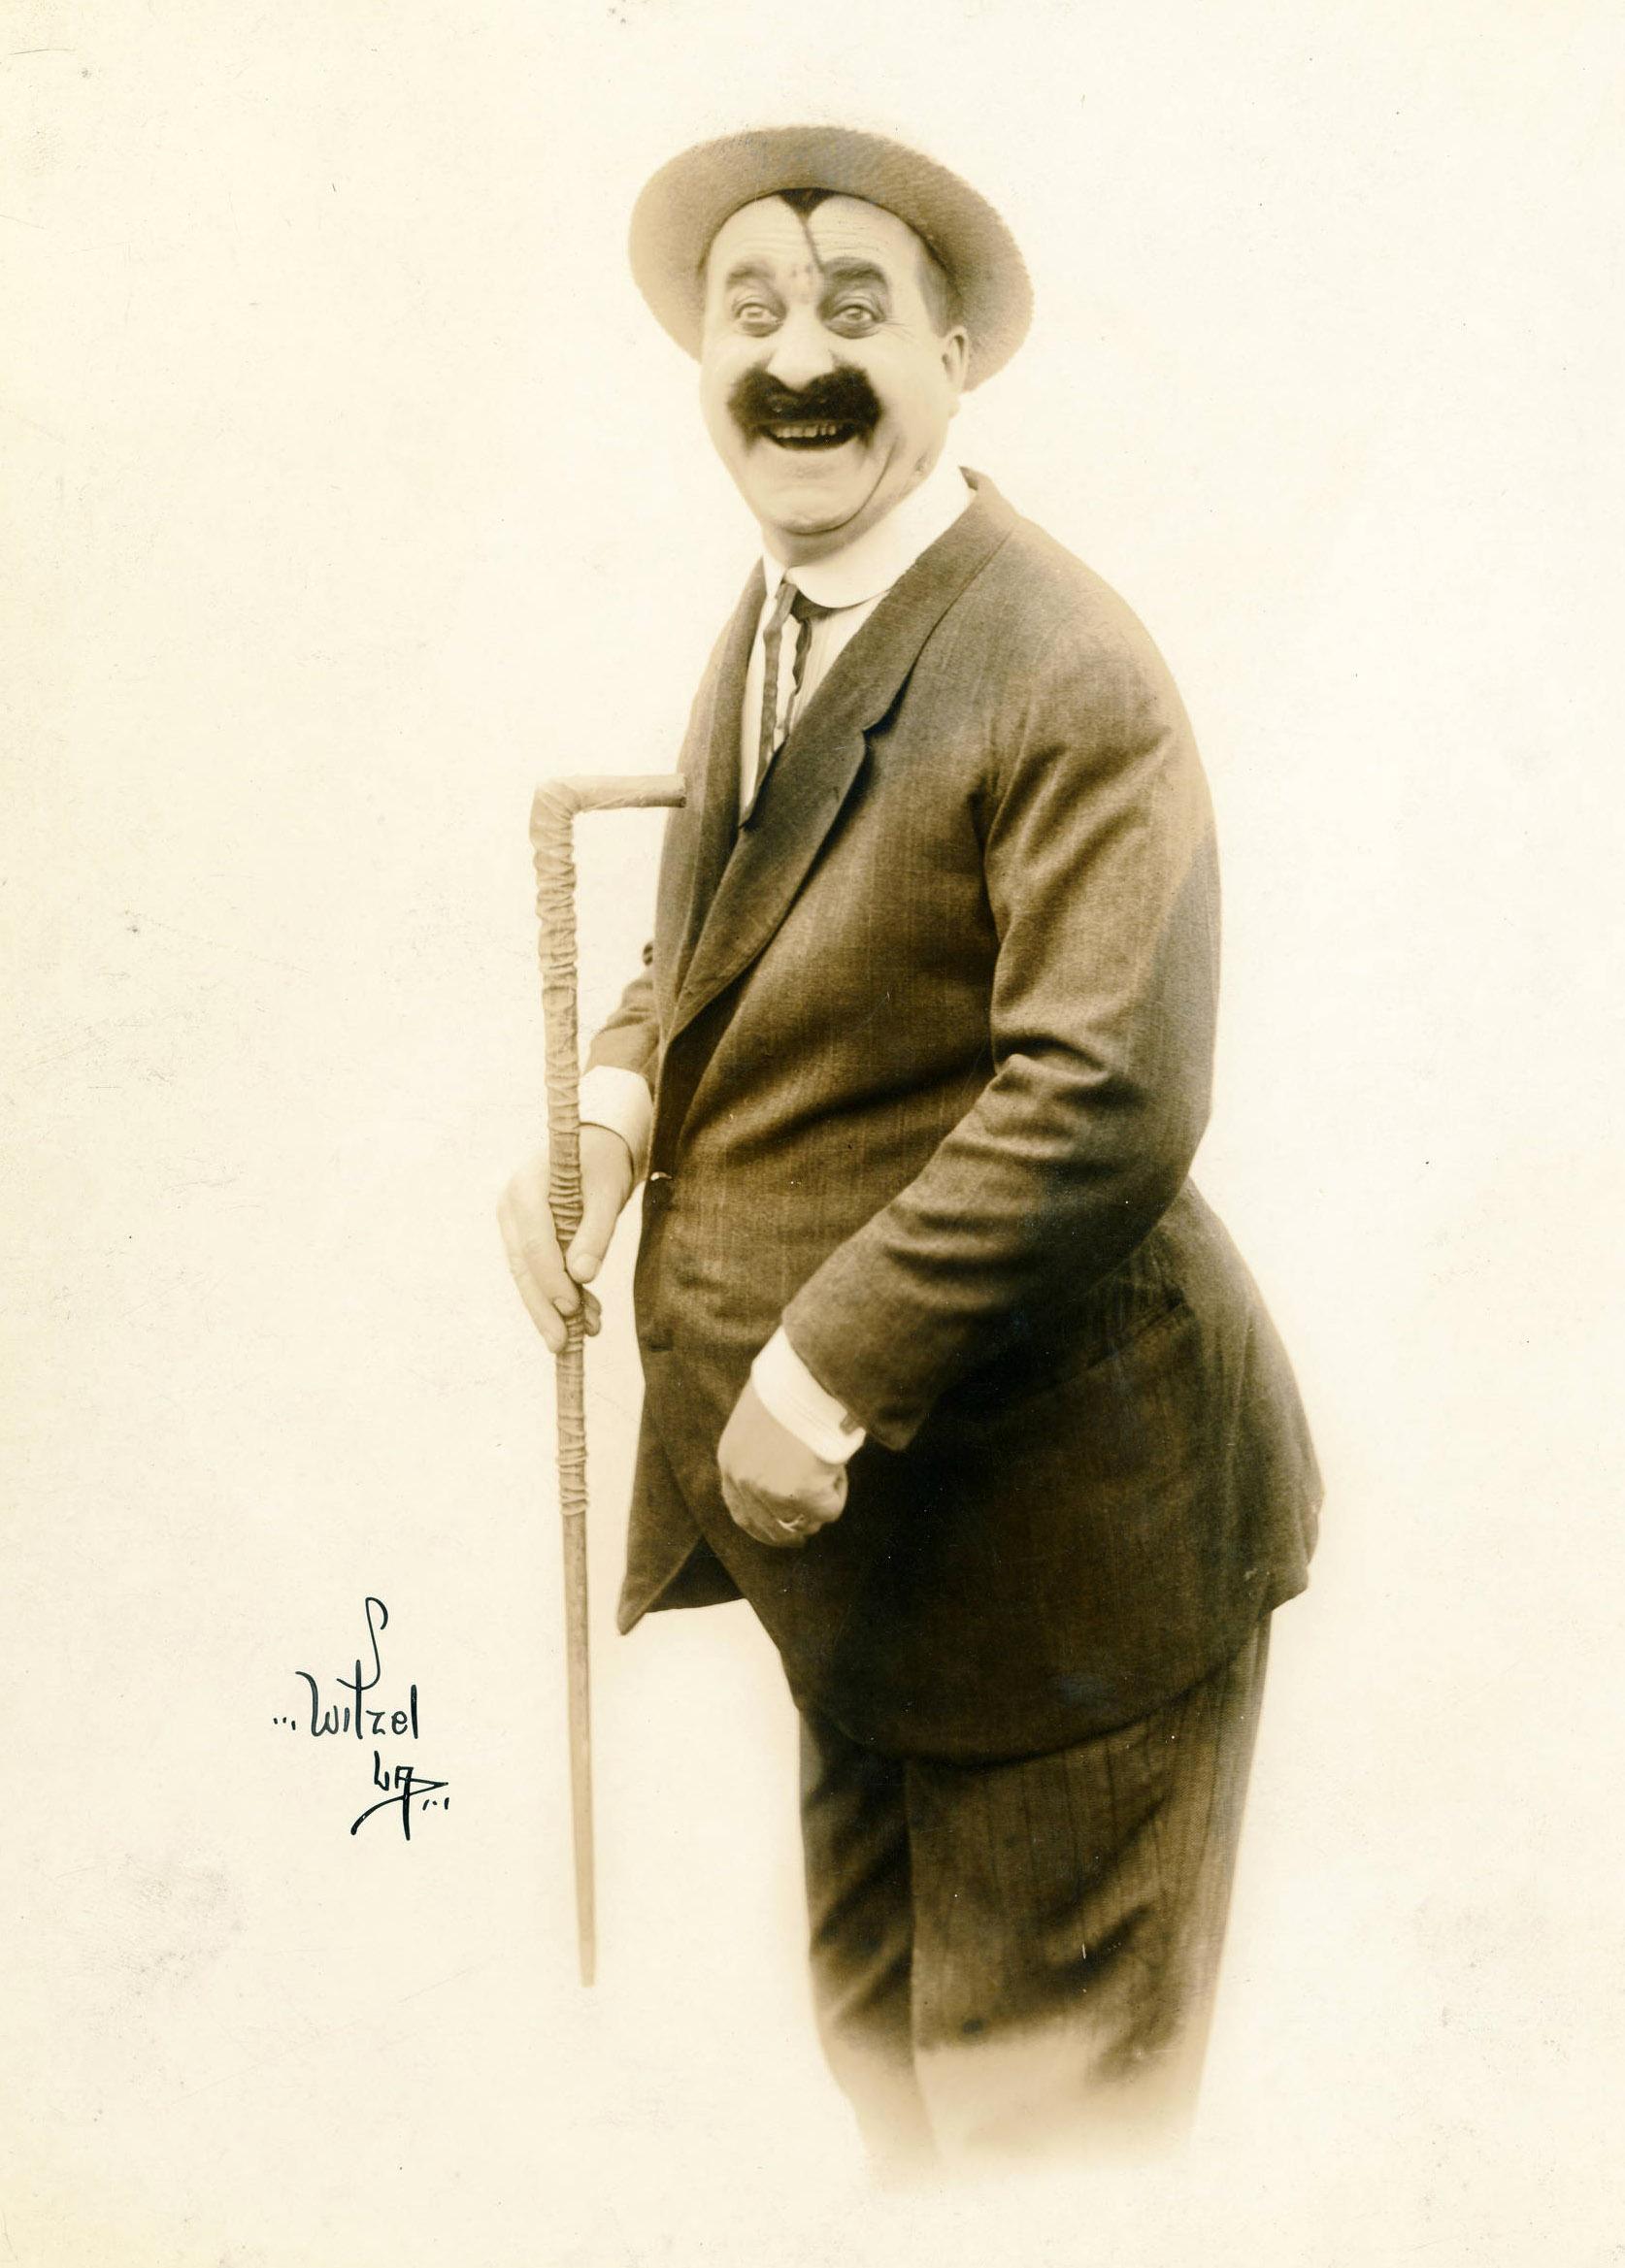 In 1920, photo by Witzel.